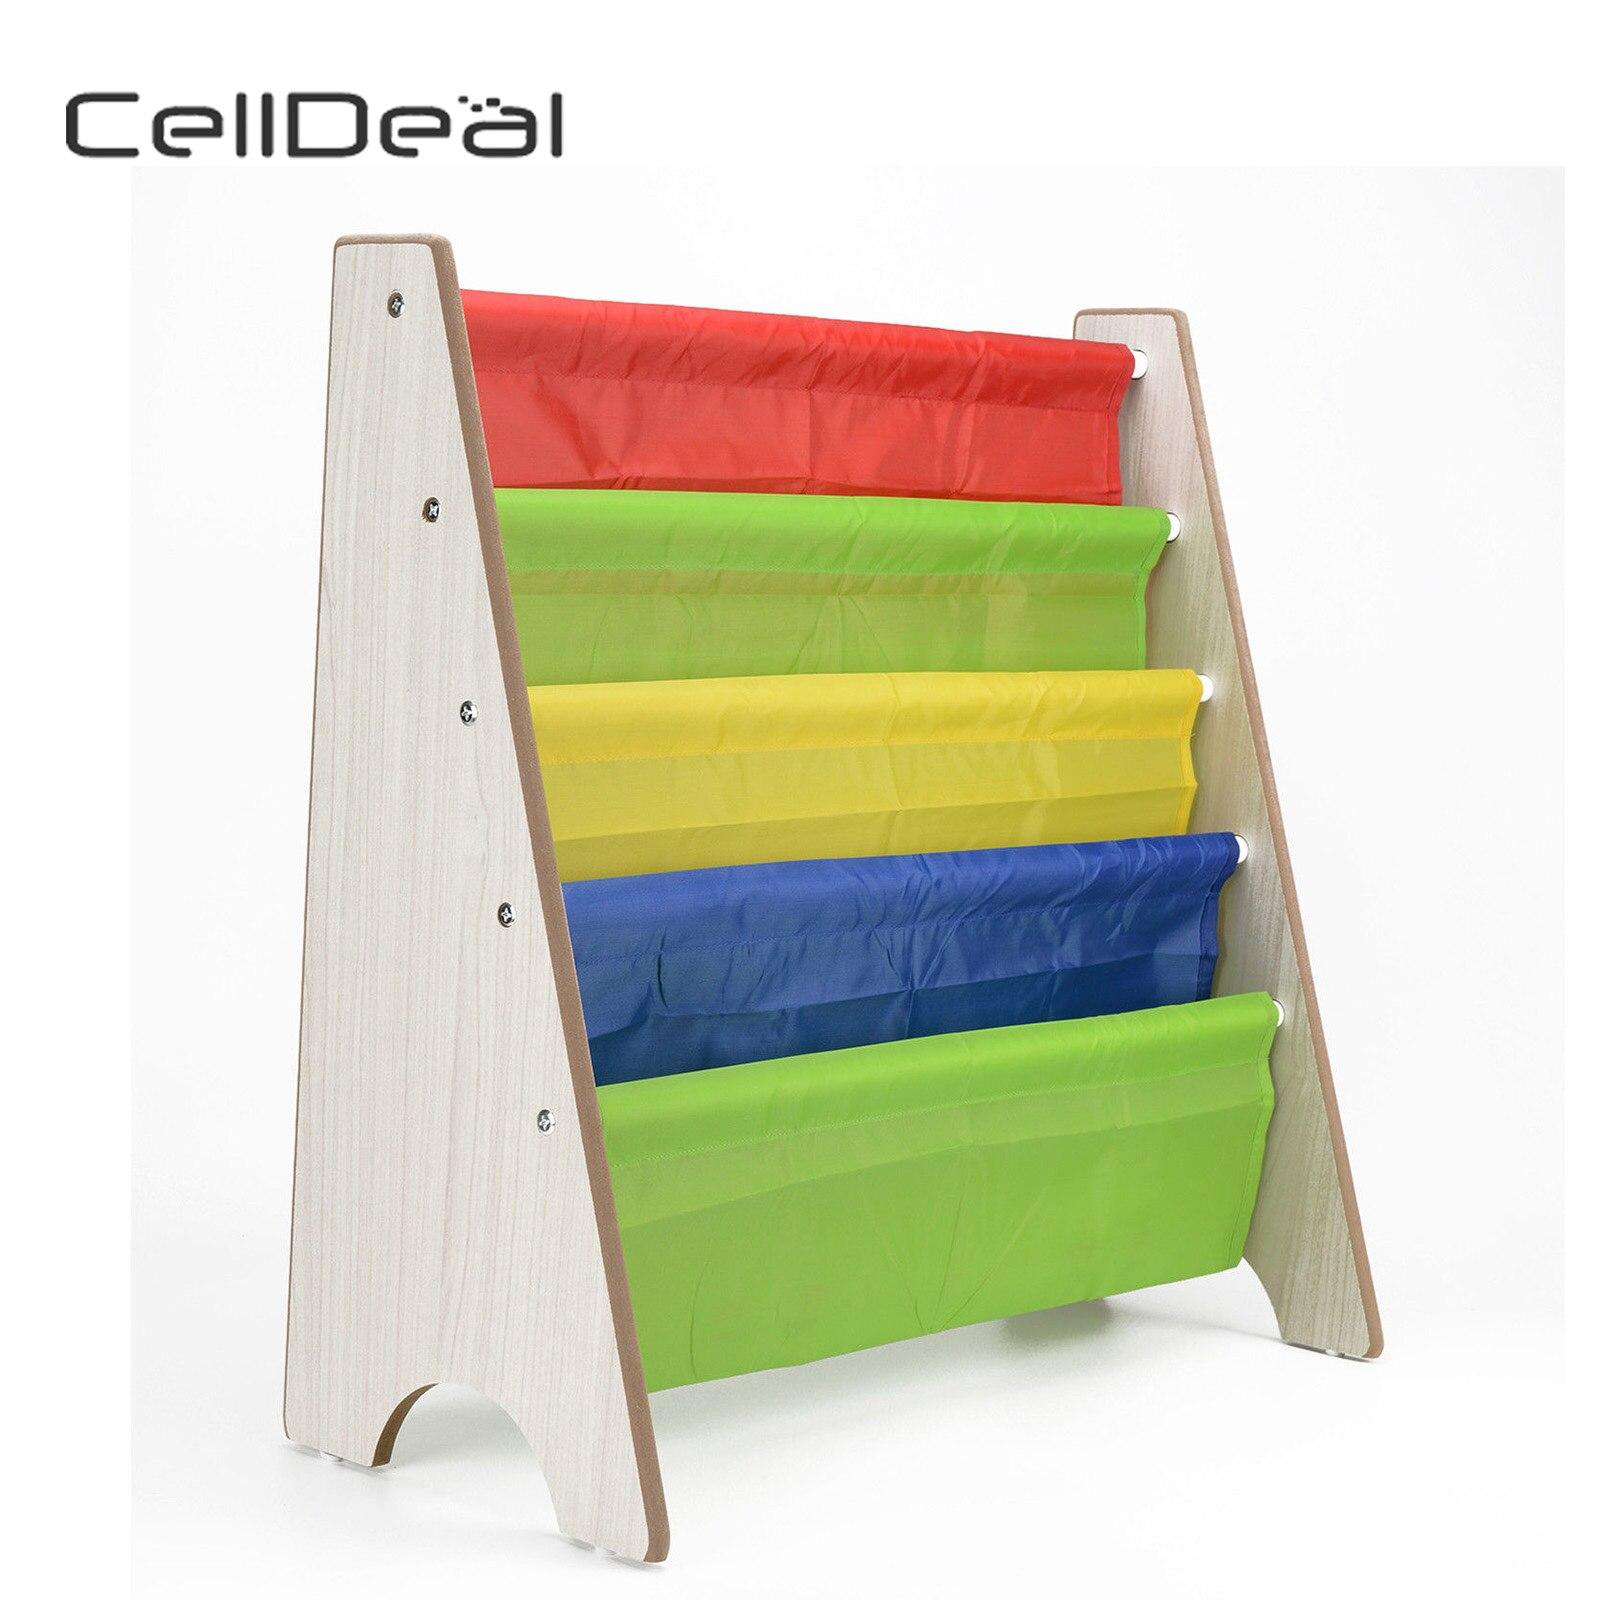 CellDeal Children Book Storage Rack Bookcase Bookshelf Tidy Bedroom Playroom Floating Shelf Bookcase Book Storage Ladder Shelf